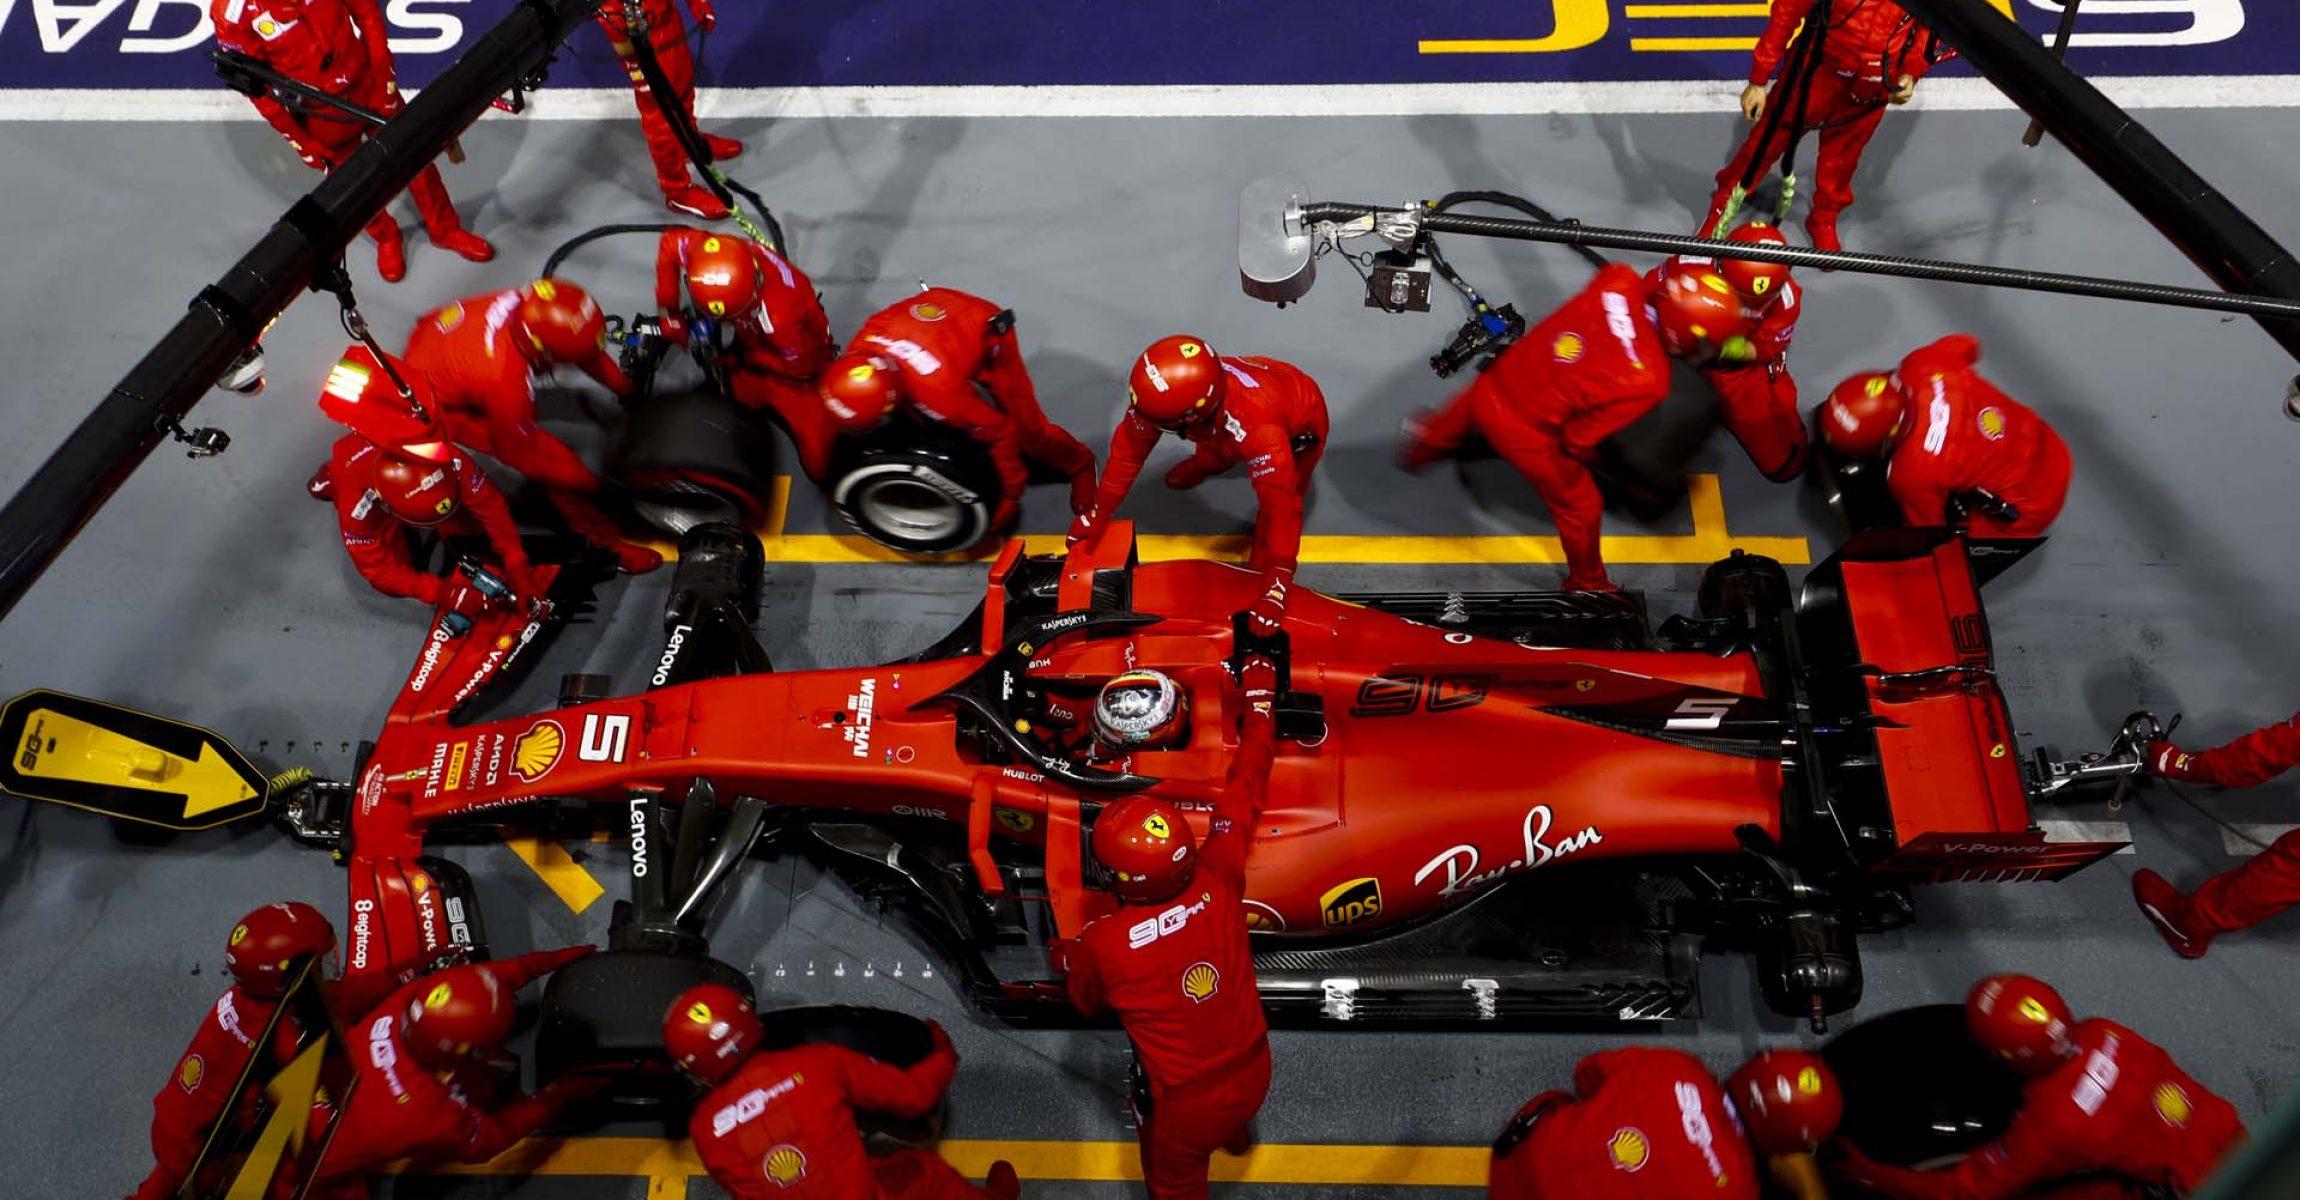 SINGAPORE STREET CIRCUIT, SINGAPORE - SEPTEMBER 22: Sebastian Vettel, Ferrari SF90 pit stop during the Singapore GP at Singapore Street Circuit on September 22, 2019 in Singapore Street Circuit, Singapore. (Photo by Sam Bloxham / LAT Images)